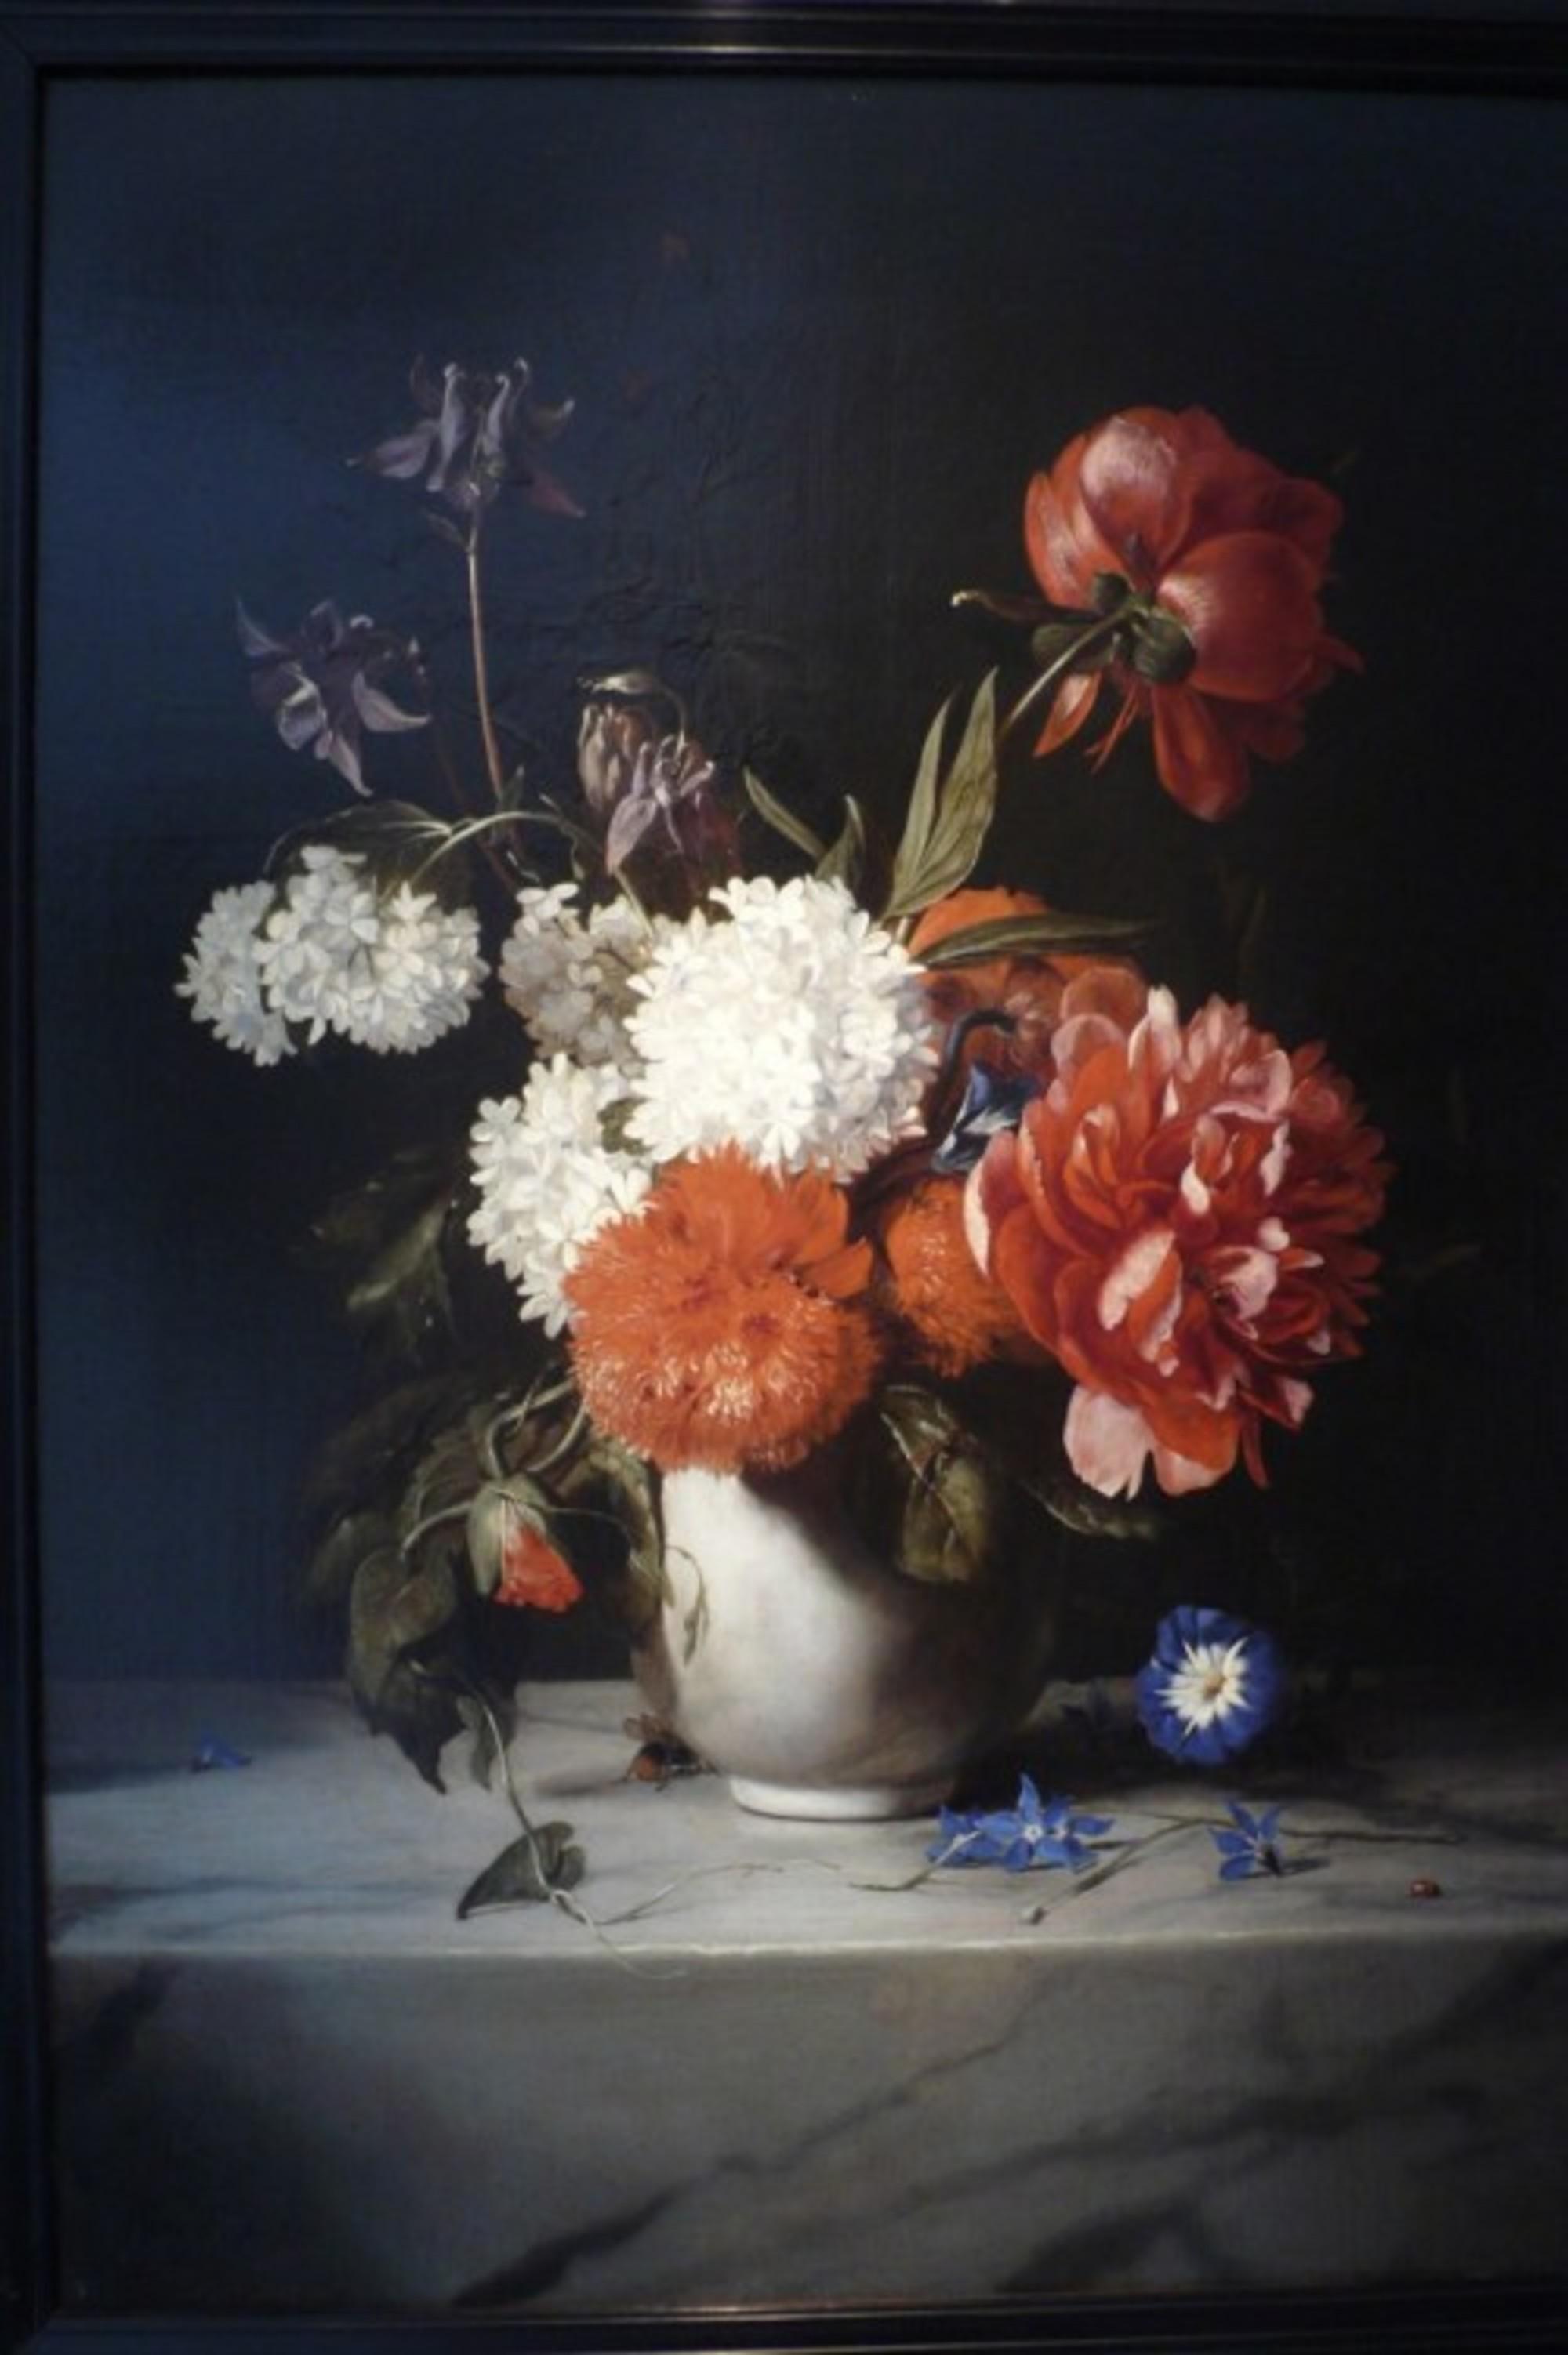 Dirck-de-Bray---Flowers-in-a-White-Stone-Vase-1671-dutch-flowers-x9056-pr.jpg